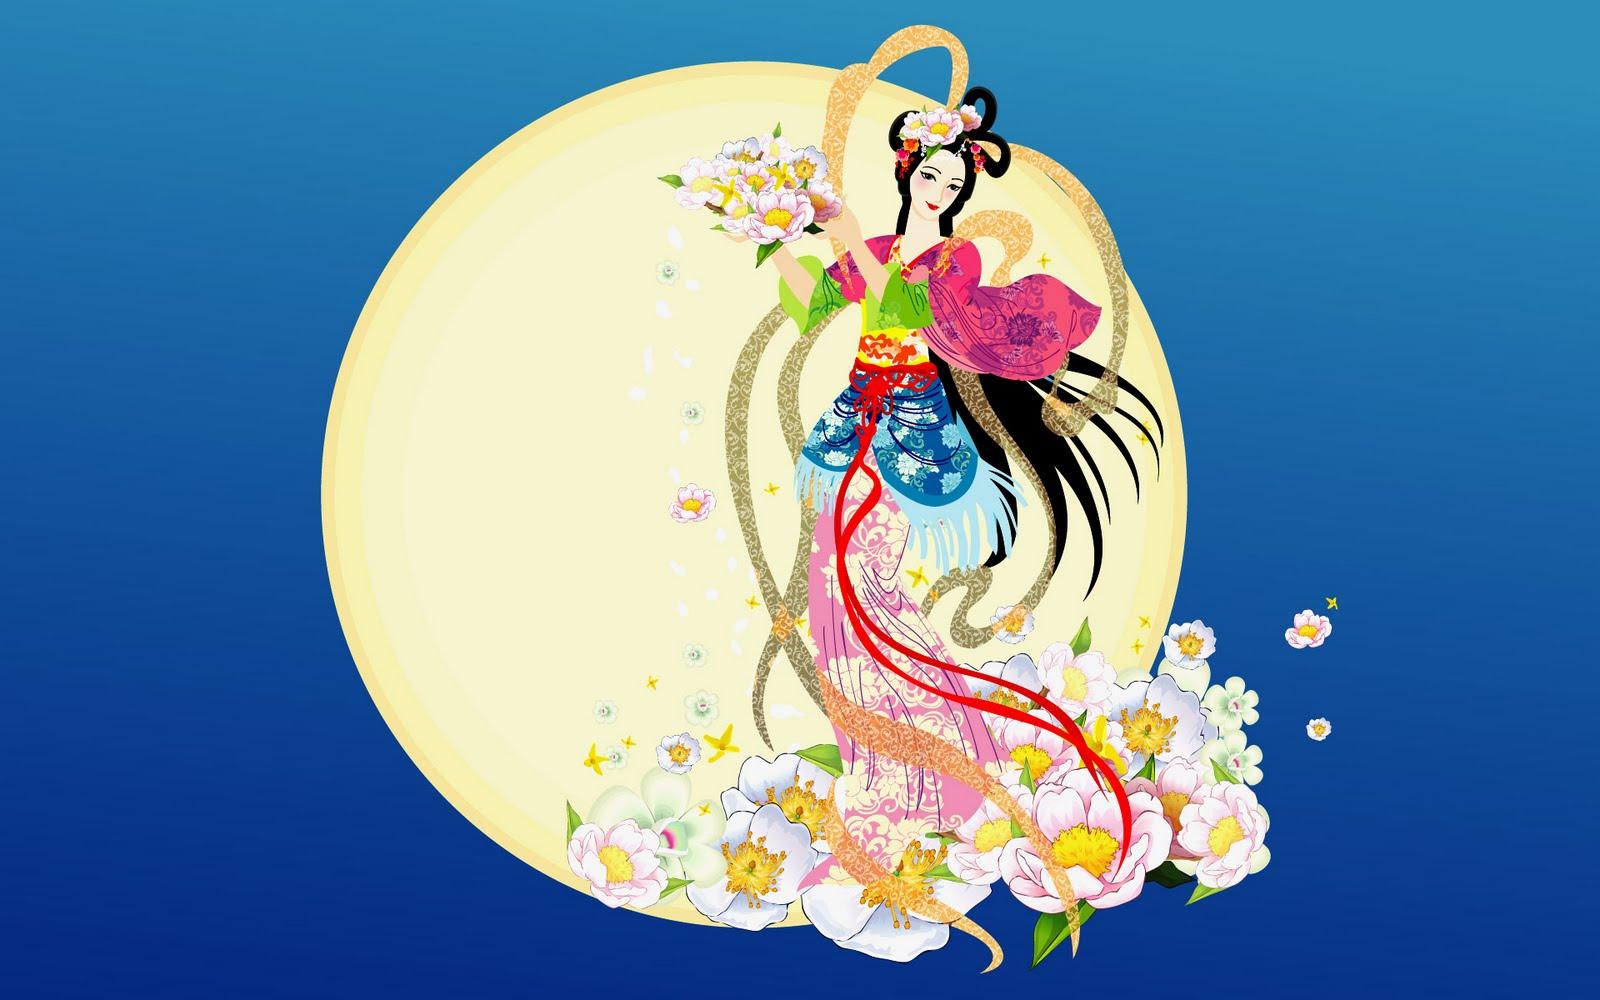 Houyi and Chang'e - the Goddess of the Moon